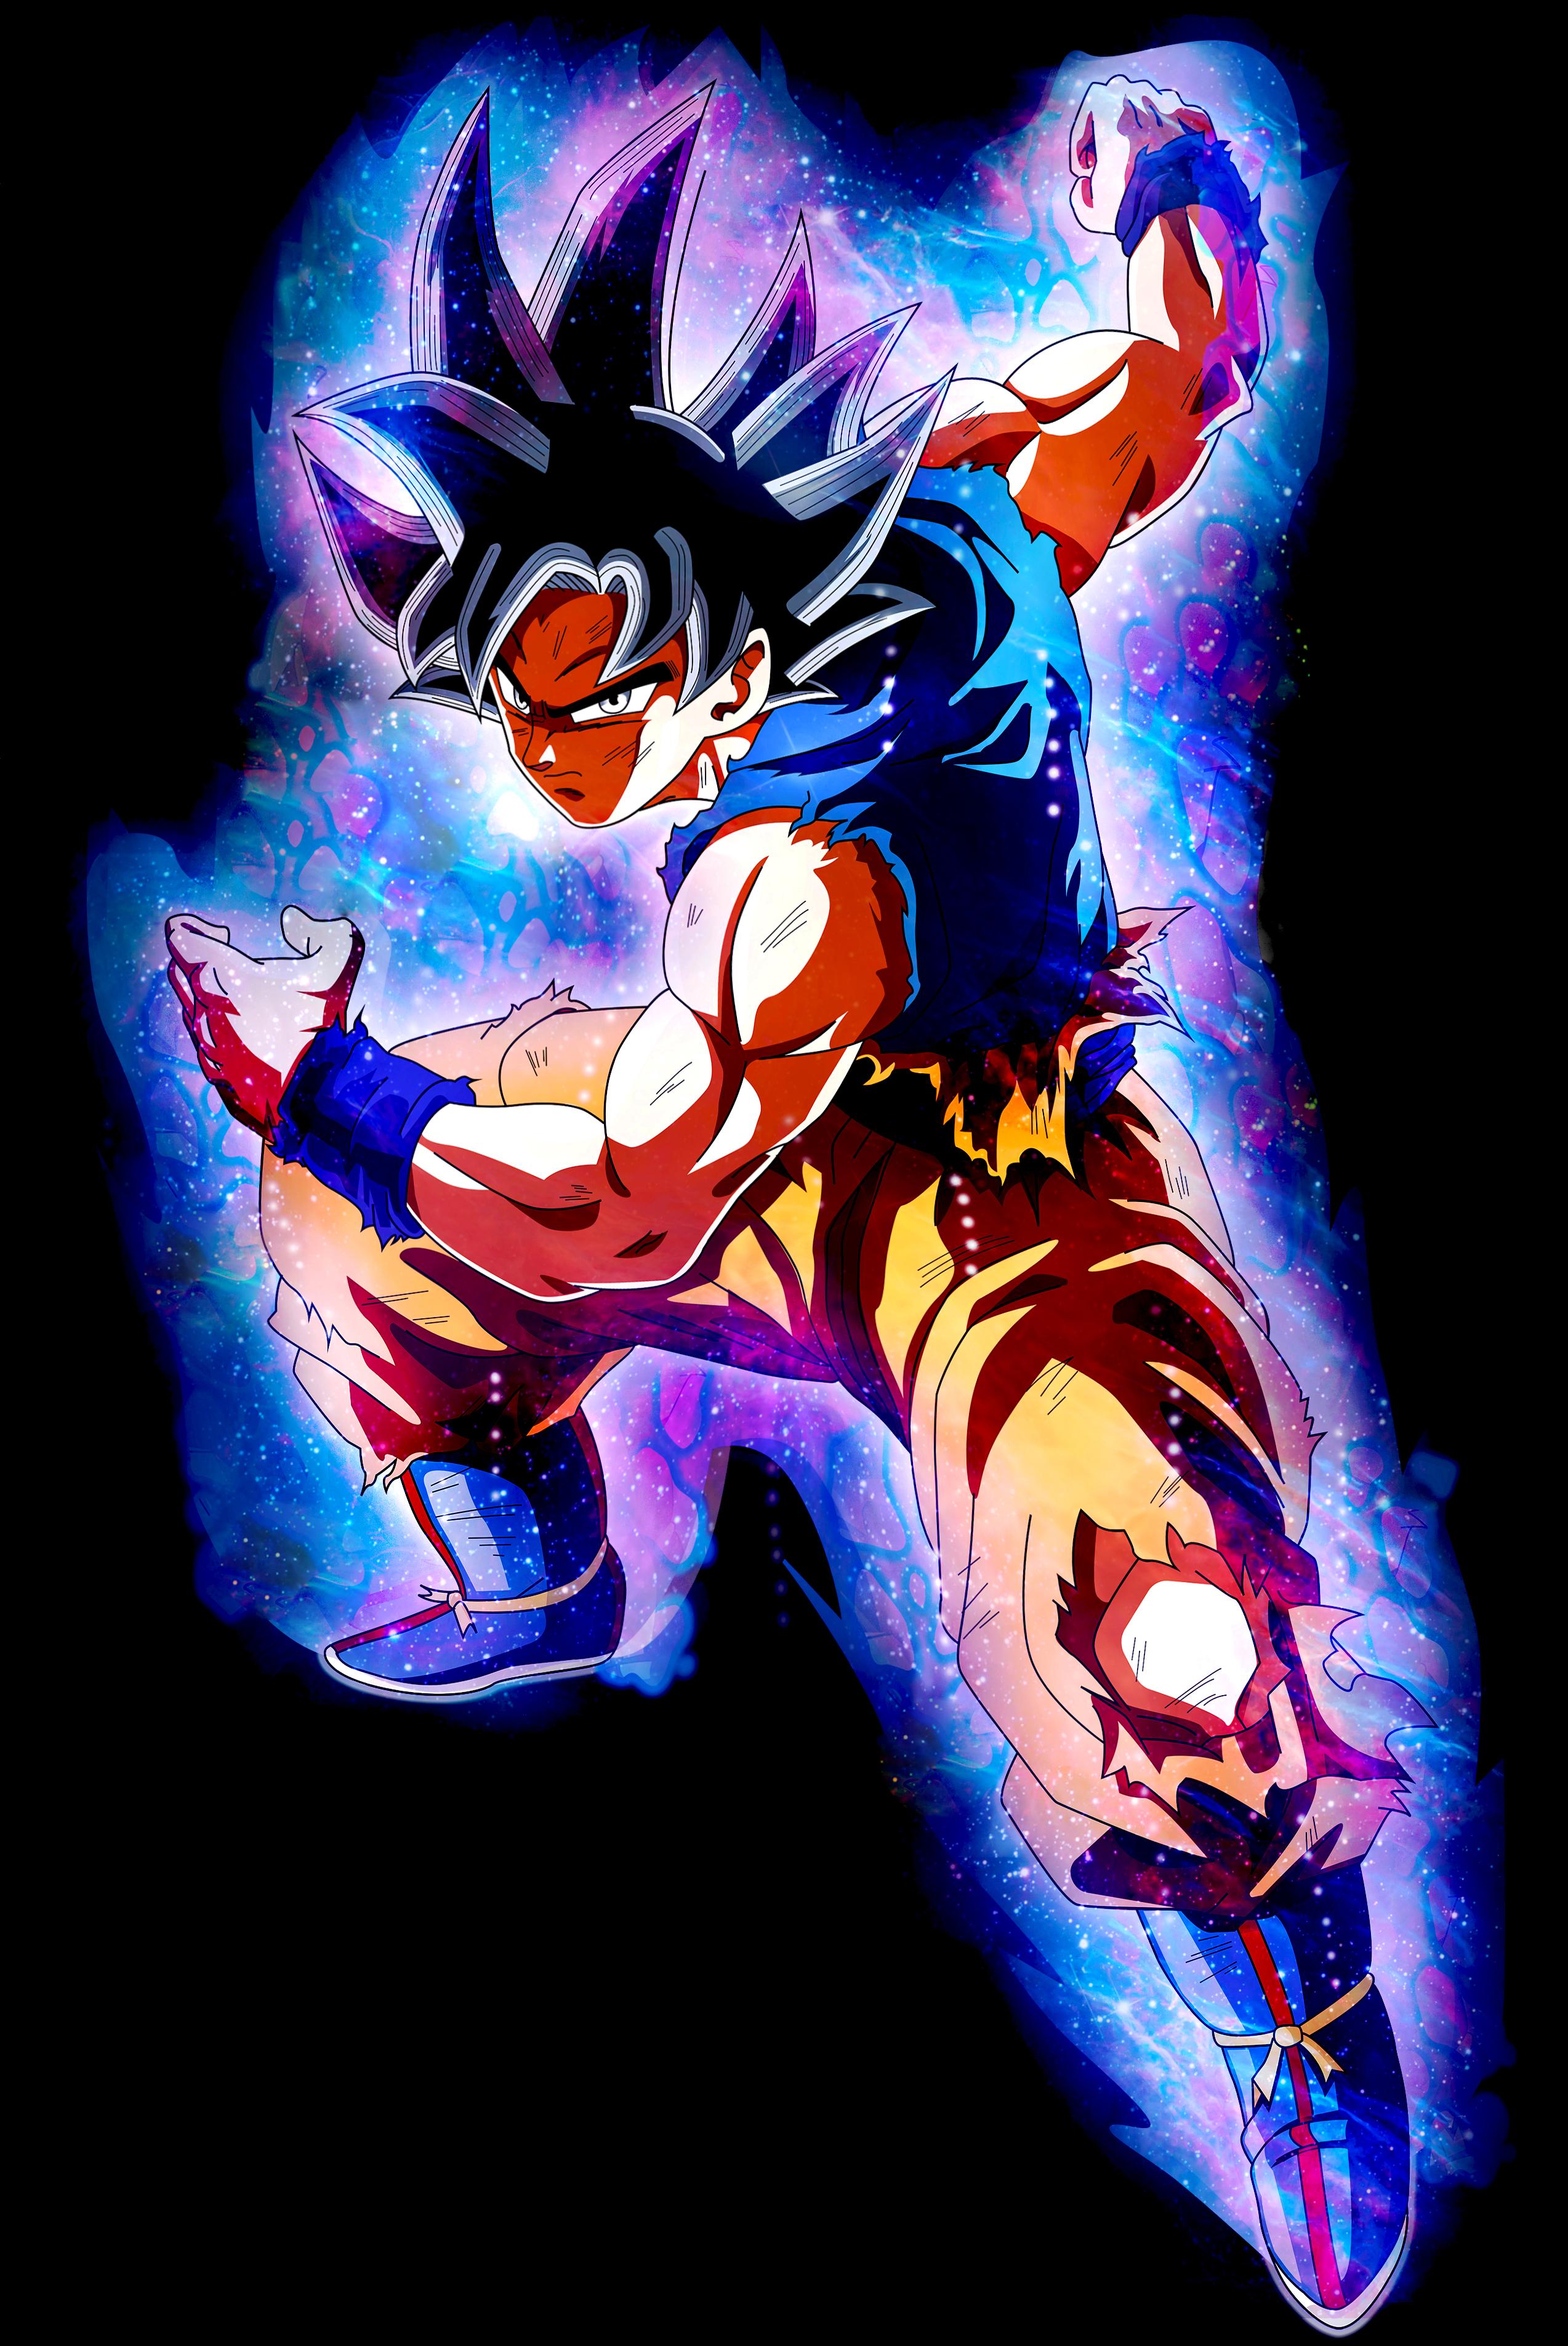 Goku Ultra Instinct Migatte No Gokui By Xyelkiltrox On Deviantart